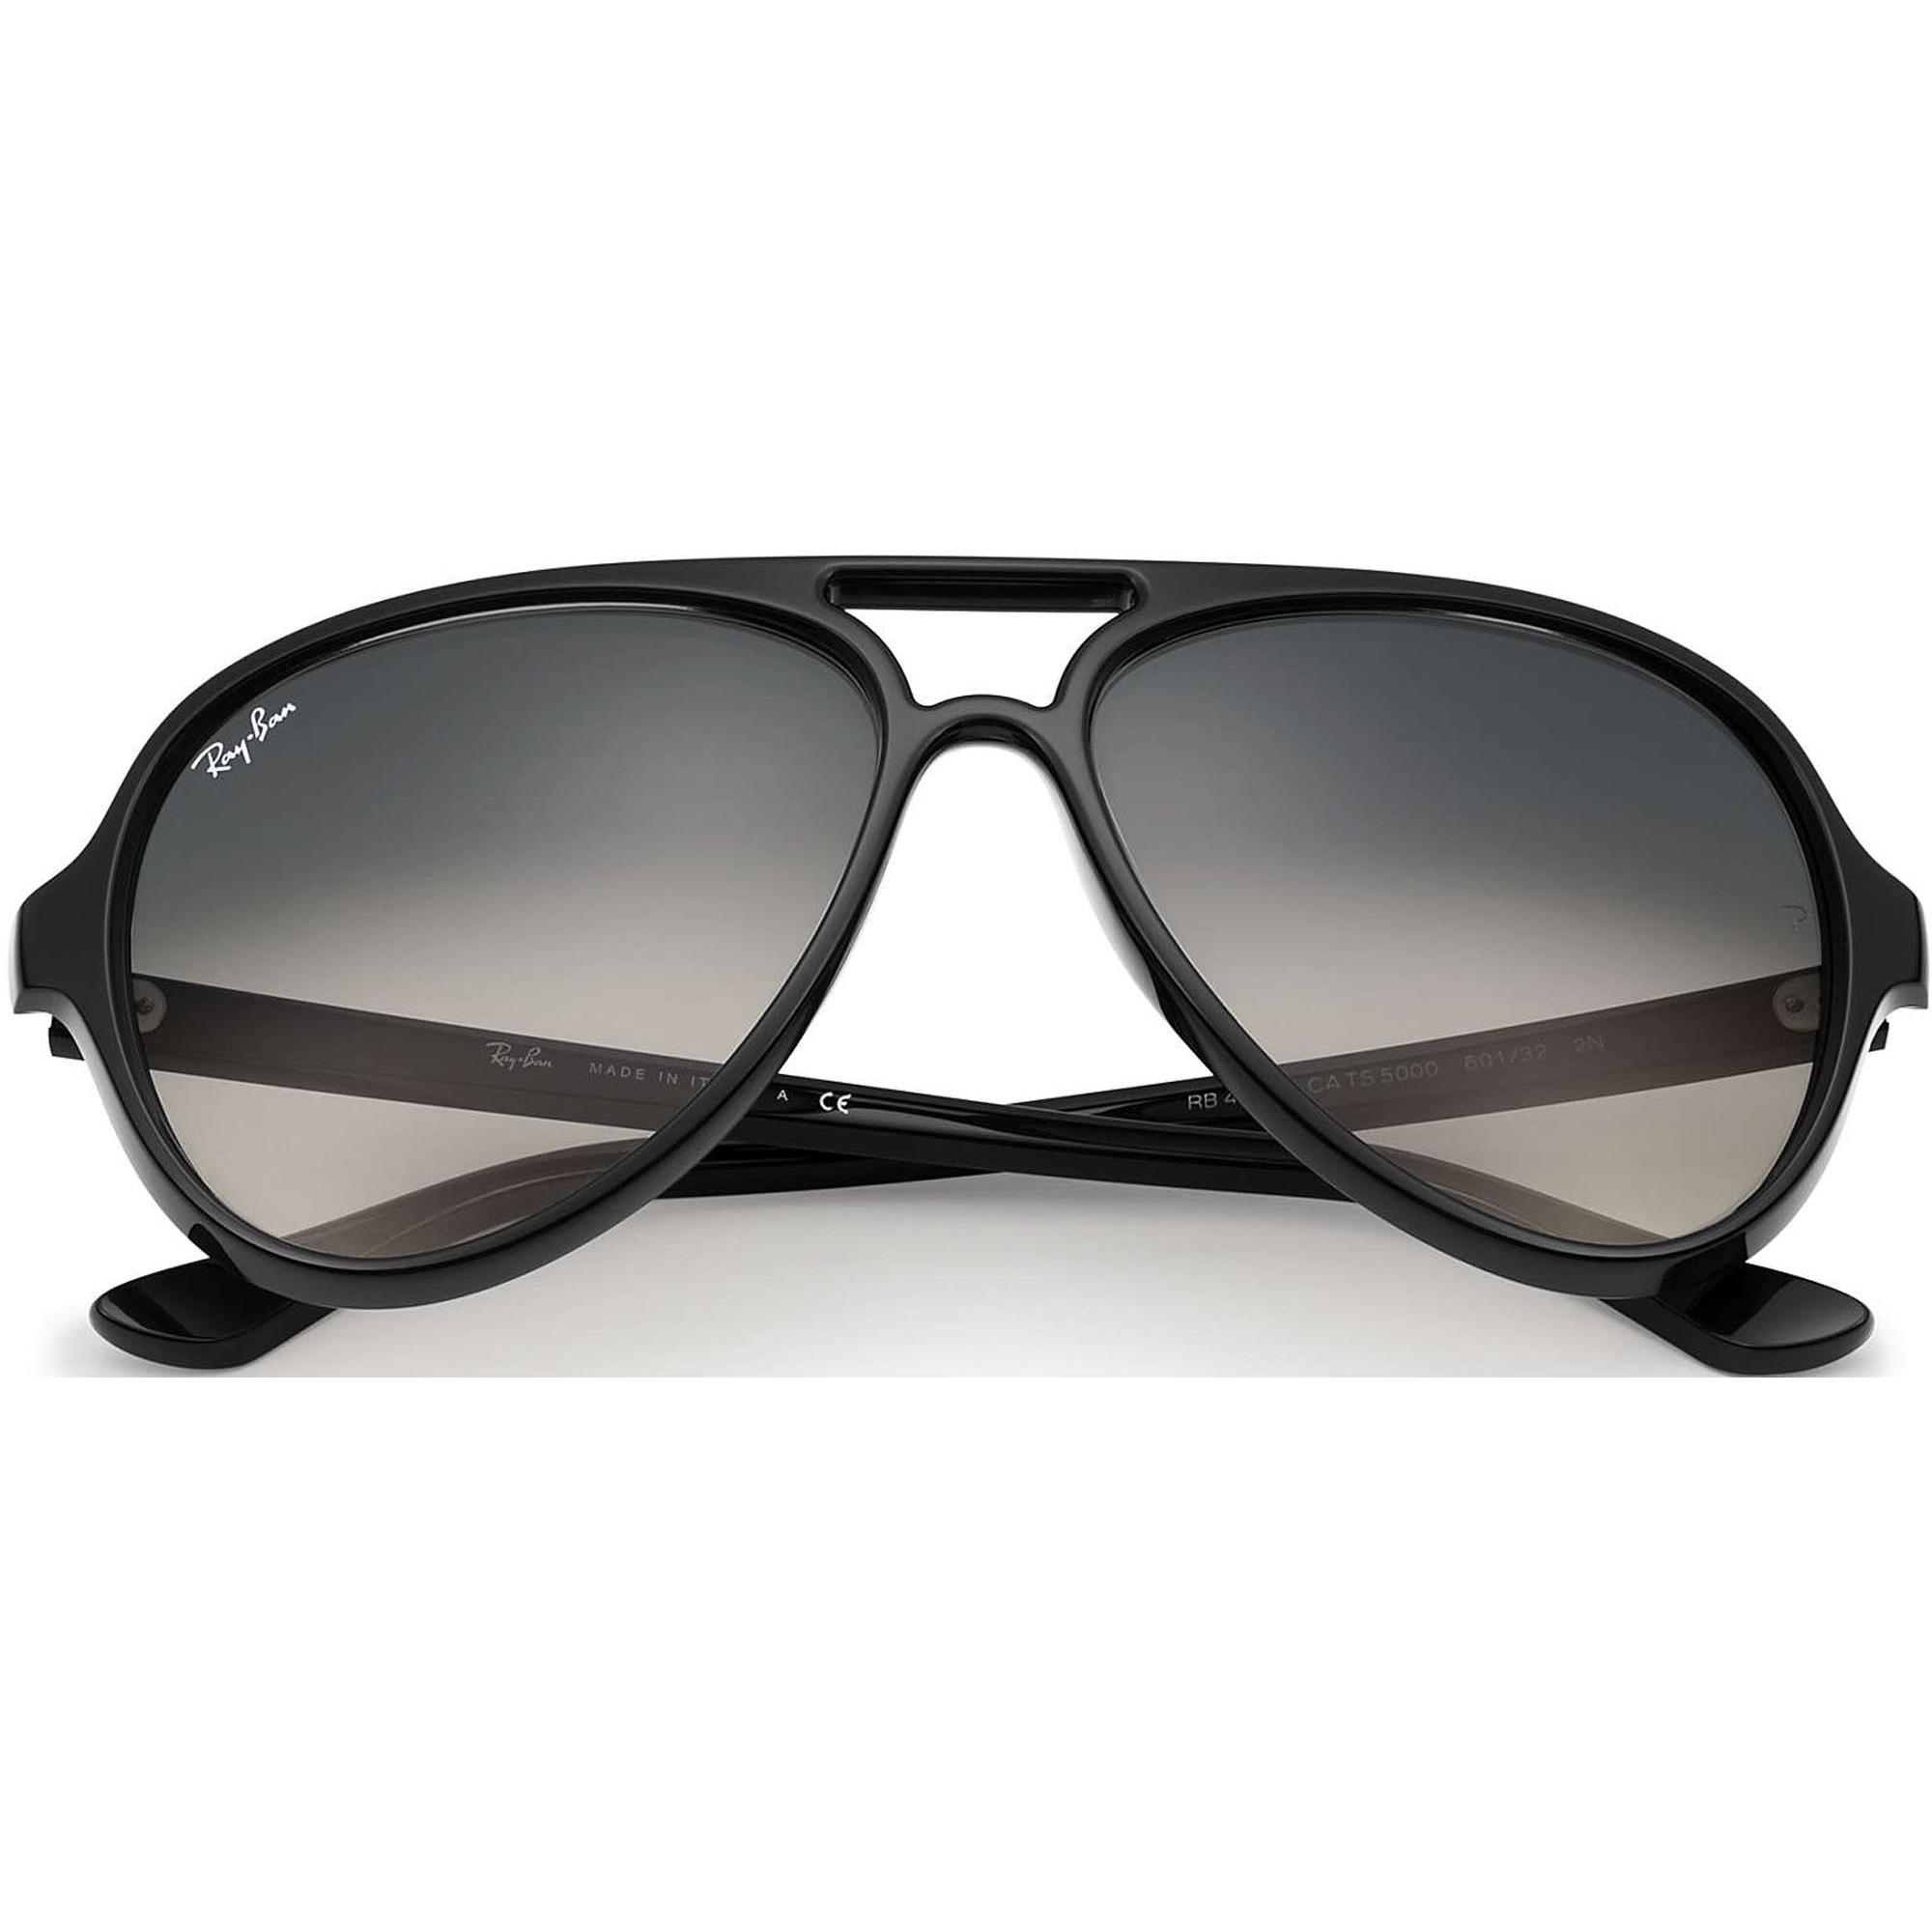 b8d8b221b0417 Ray Ban Sunglasses Cats 5000 Black Crystal Sunglasses RB4125 601 32